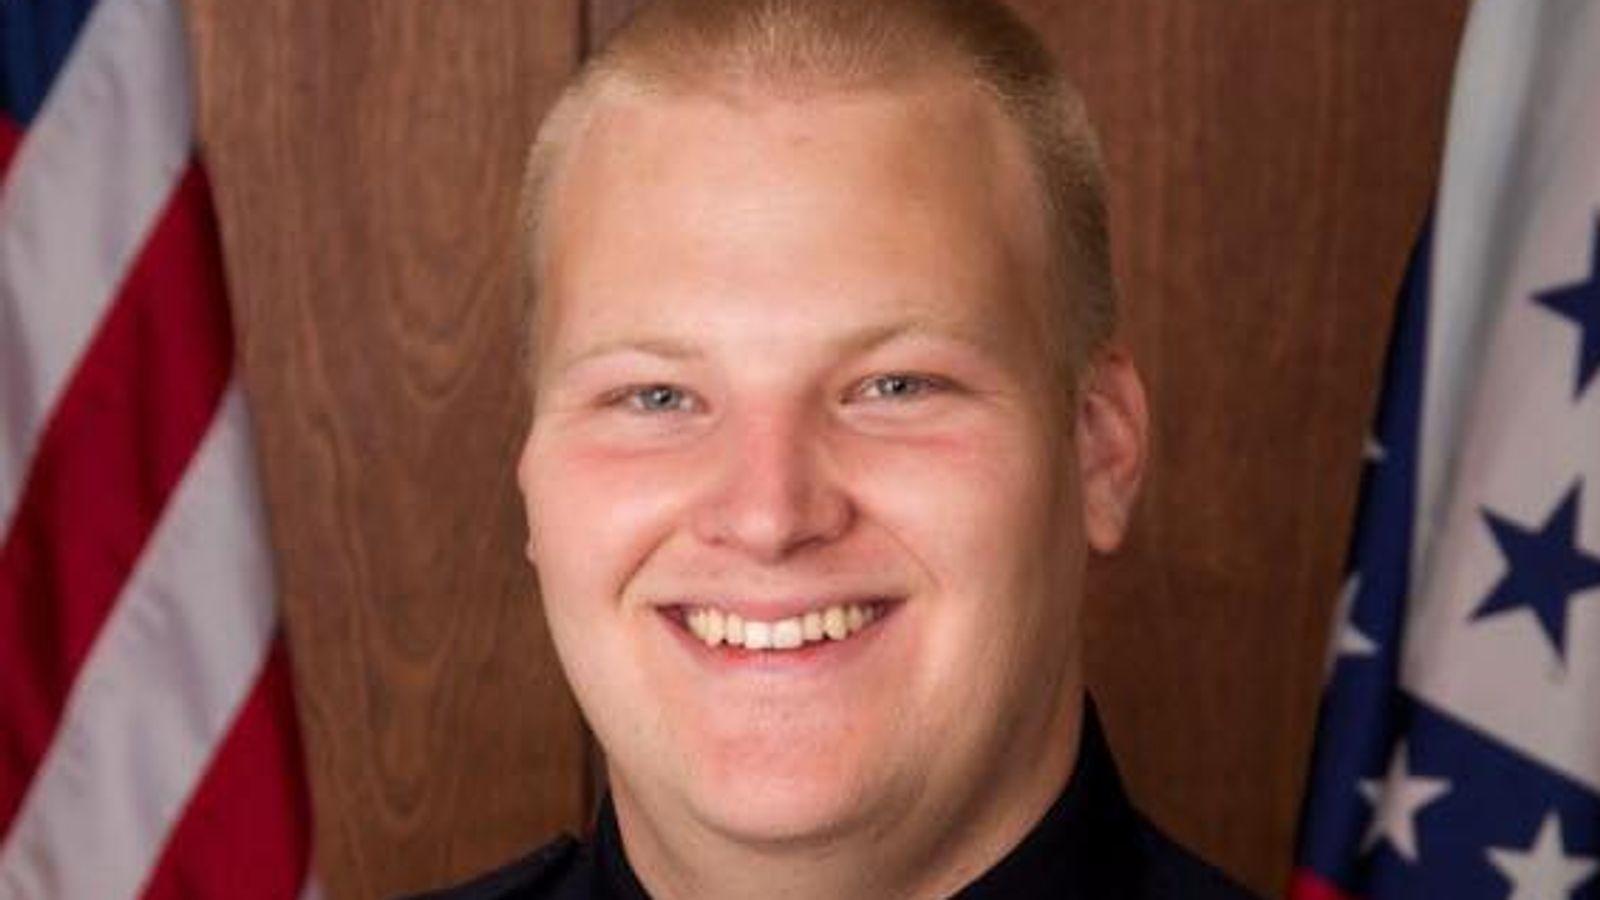 Policeman 'ambushed and executed' in patrol car